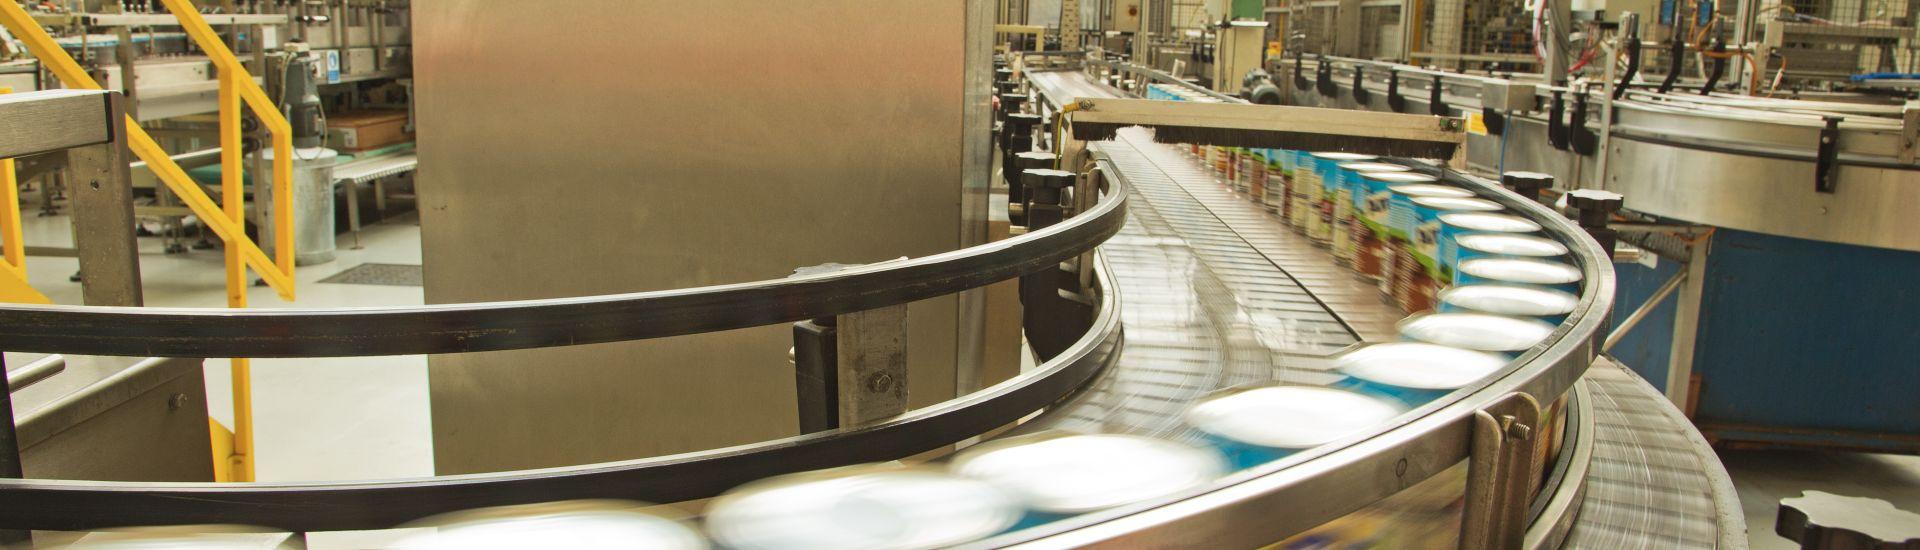 powering-more-energy-efficient-production-for-premier-foods-case-banner.jpg